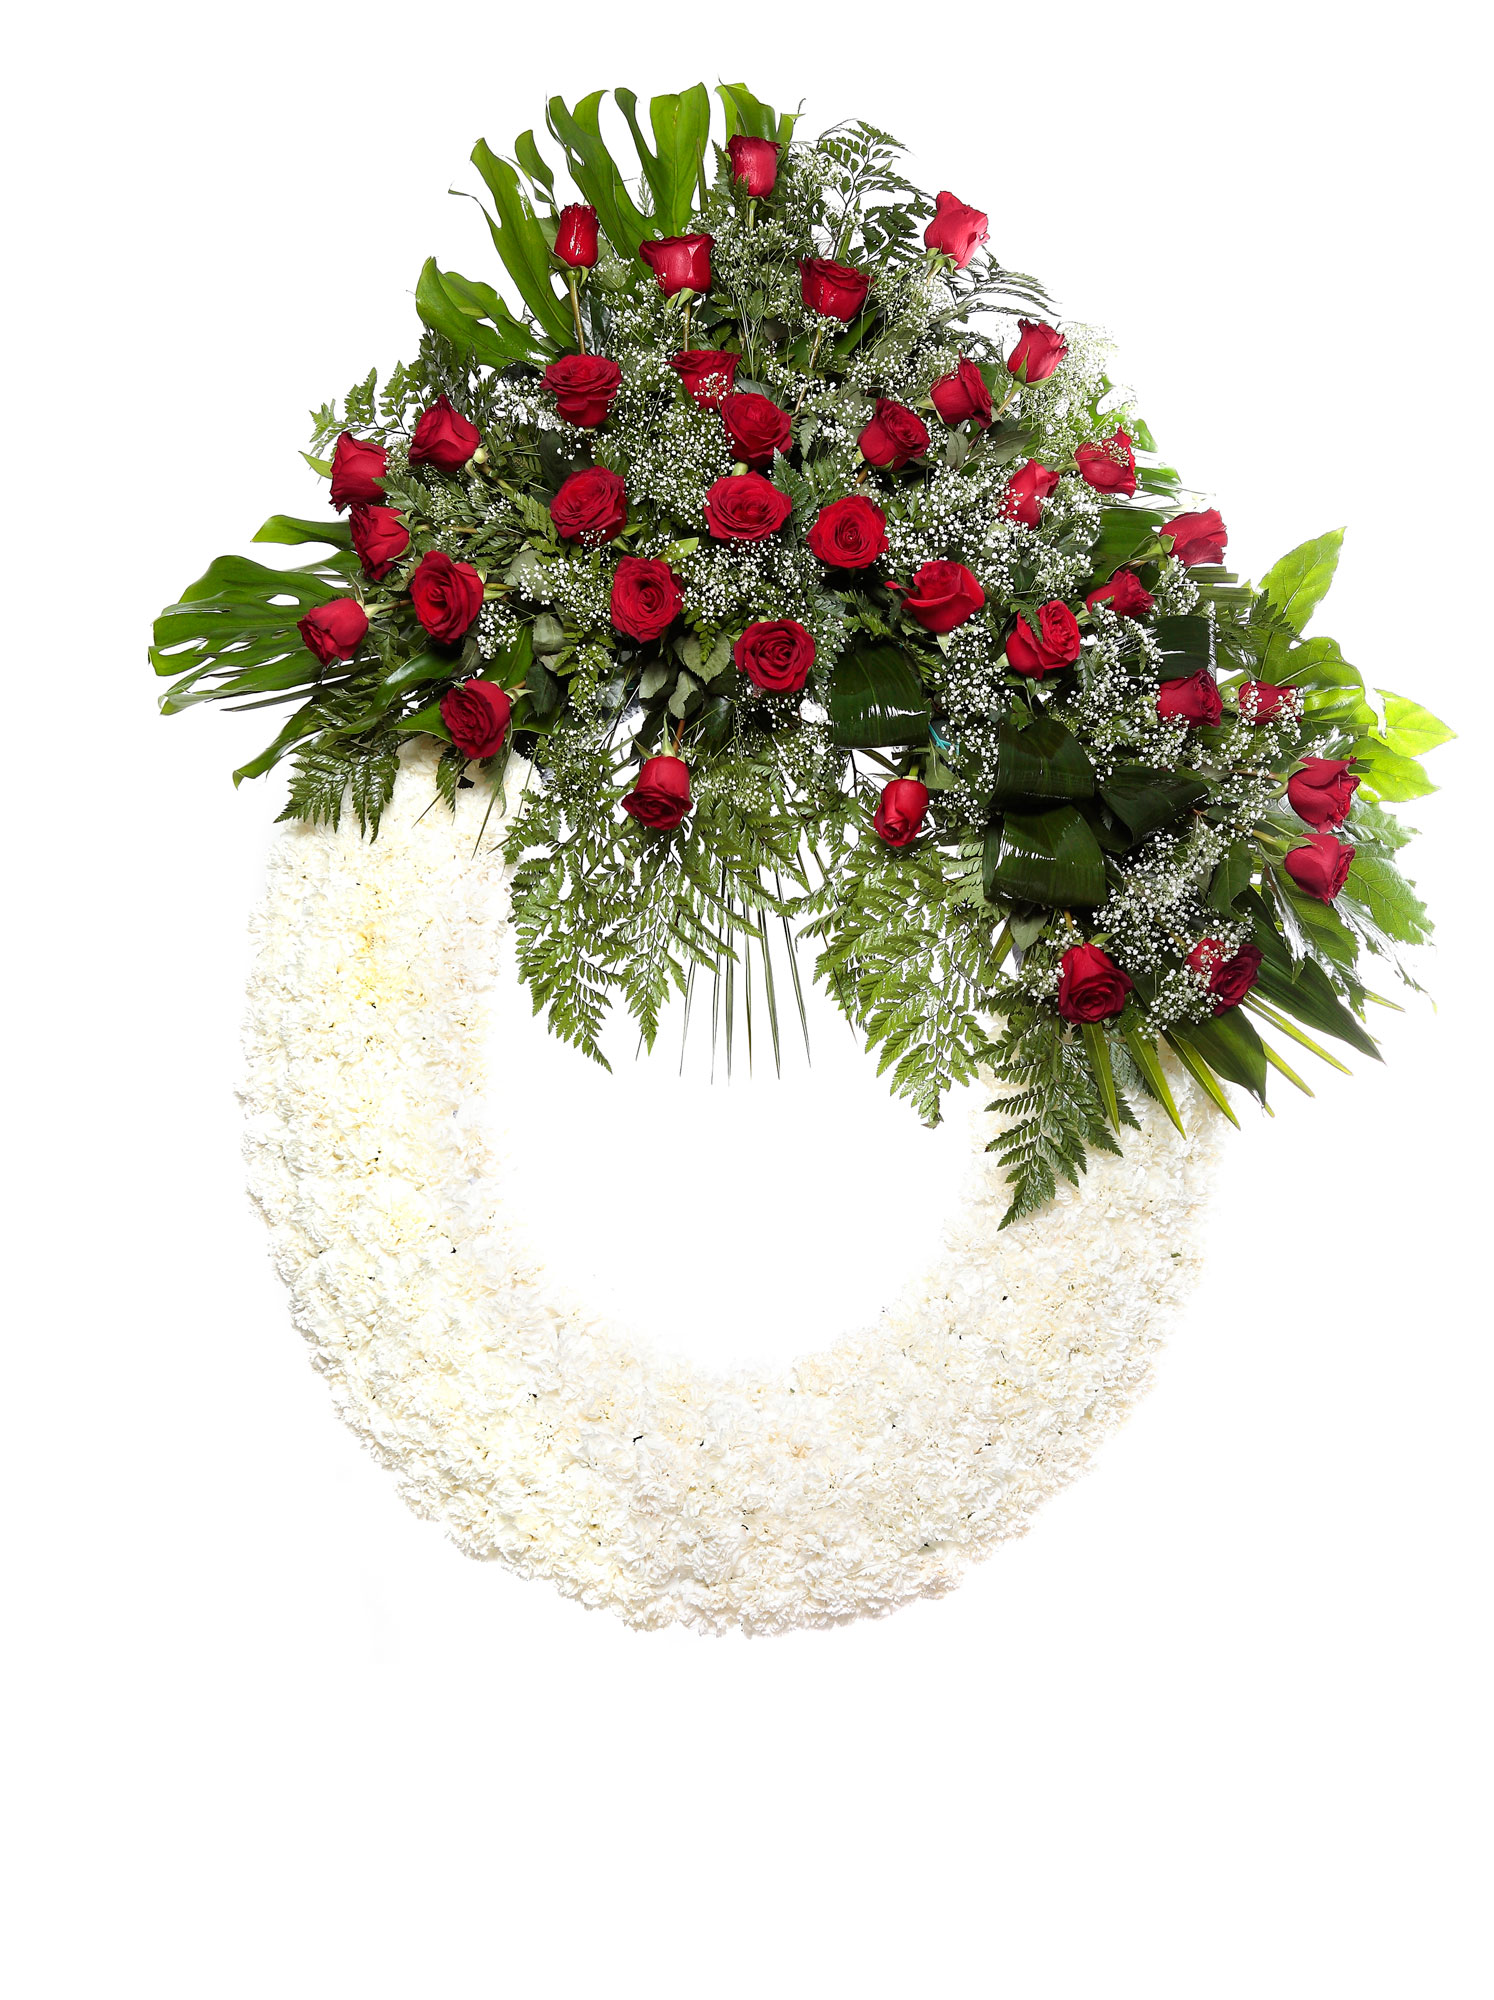 Corona flores tanatorio 5 q coronas flores naturales for Los jardines tanatorio